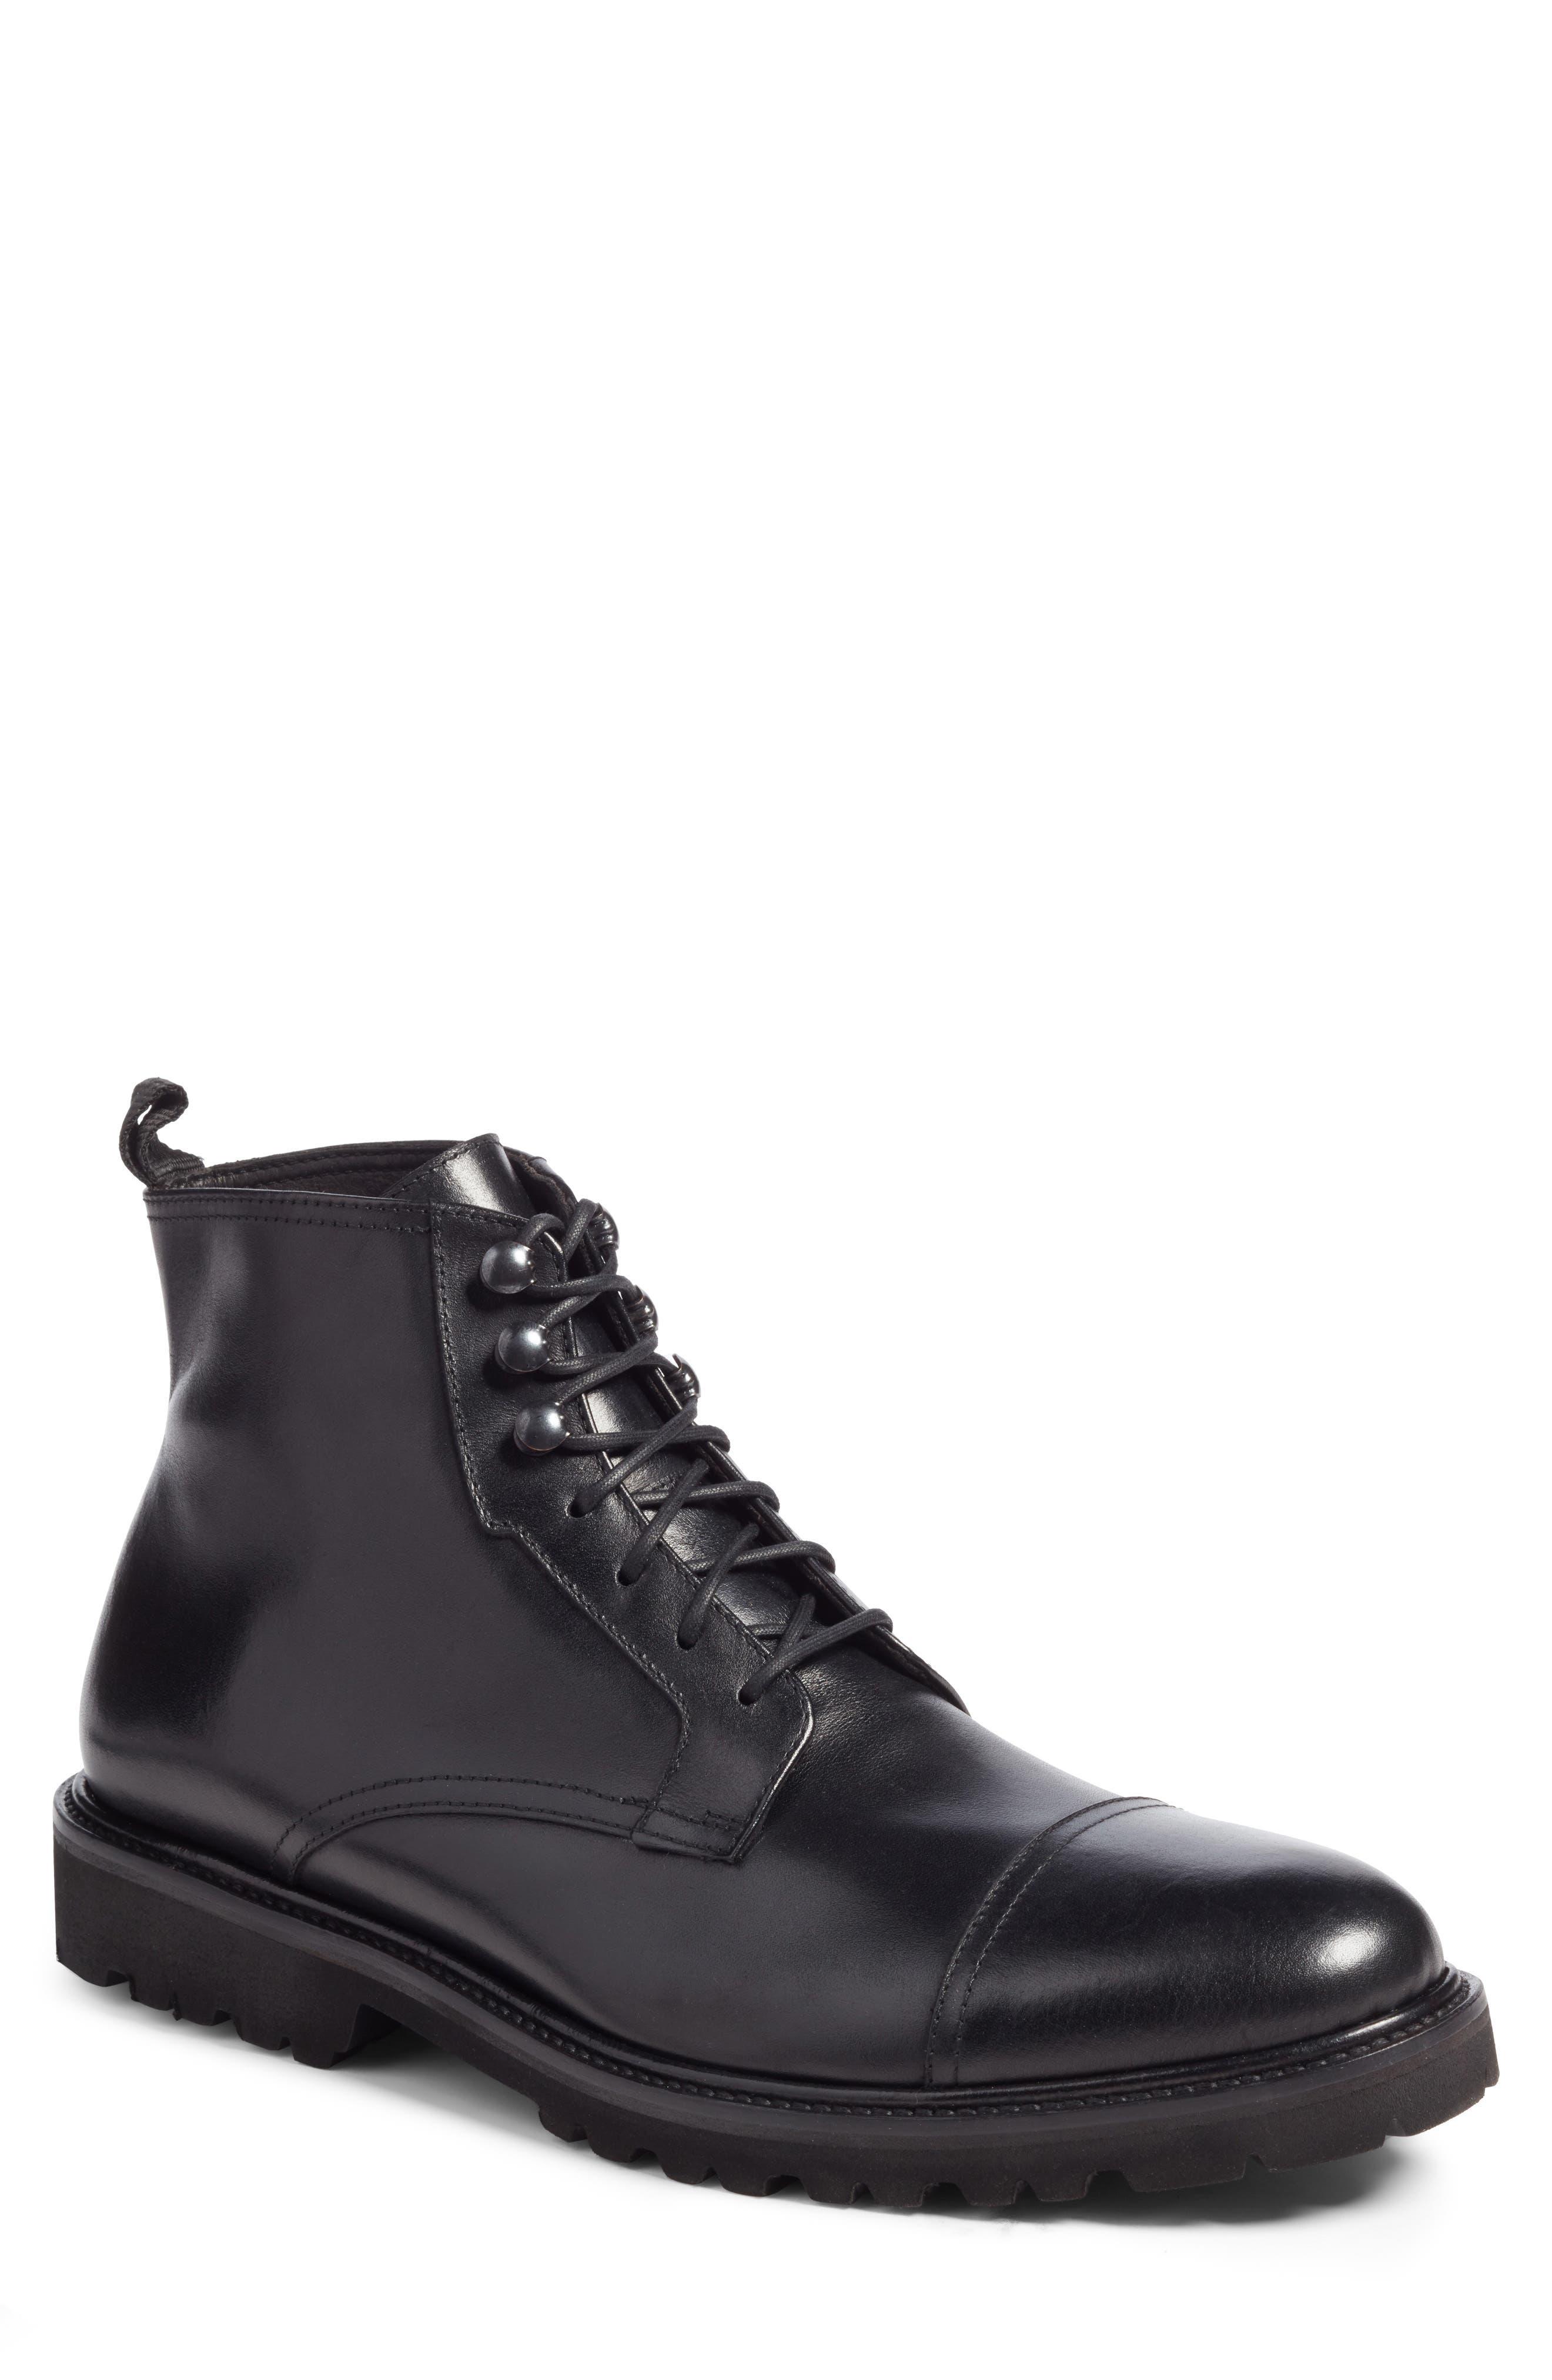 Monte Rosso Tropea Waterproof Cap Toe Boot (Men)